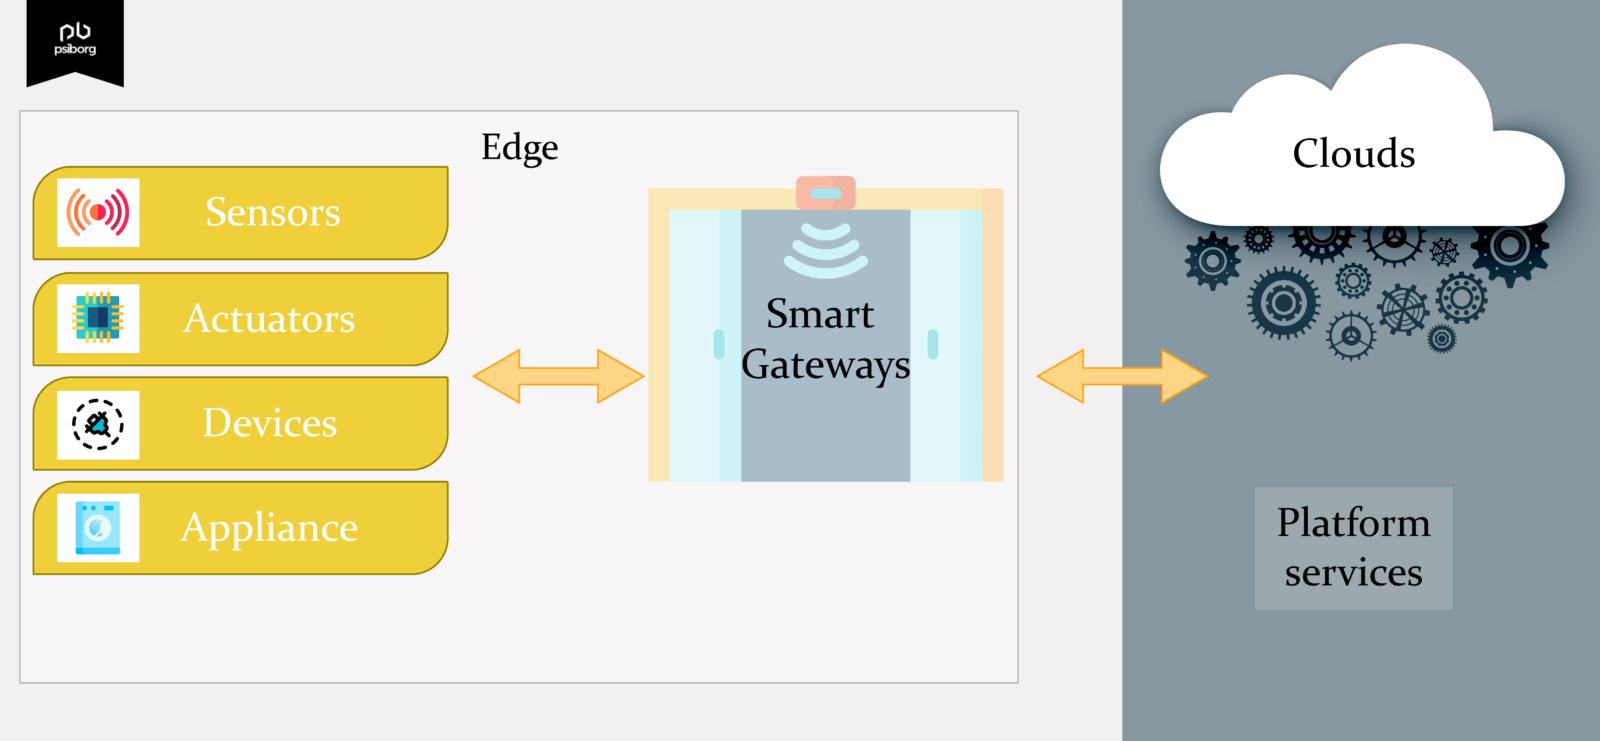 sensor devices communicate on LPWAN